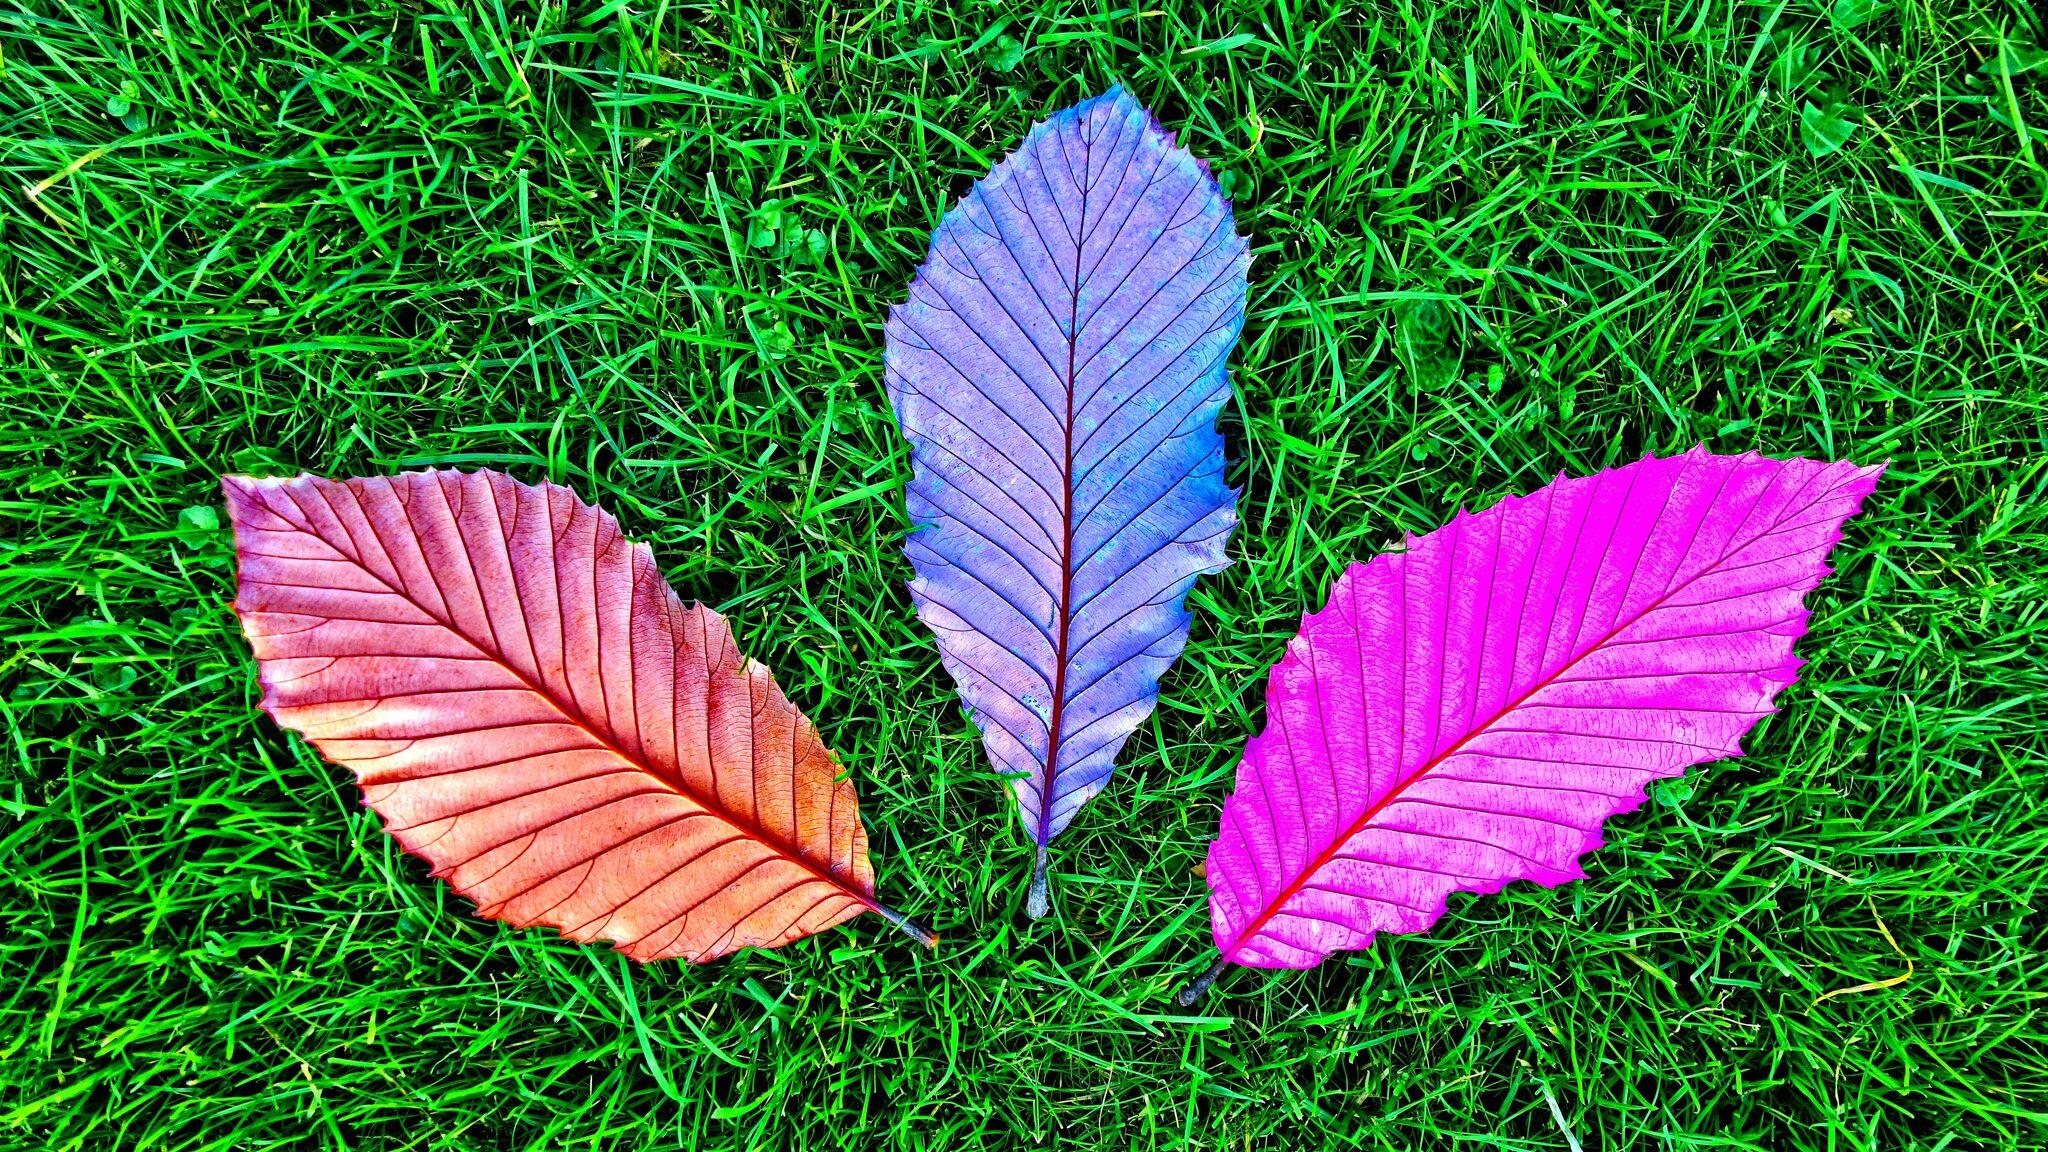 Grass Fallen Colorful Leaves 5k Pz